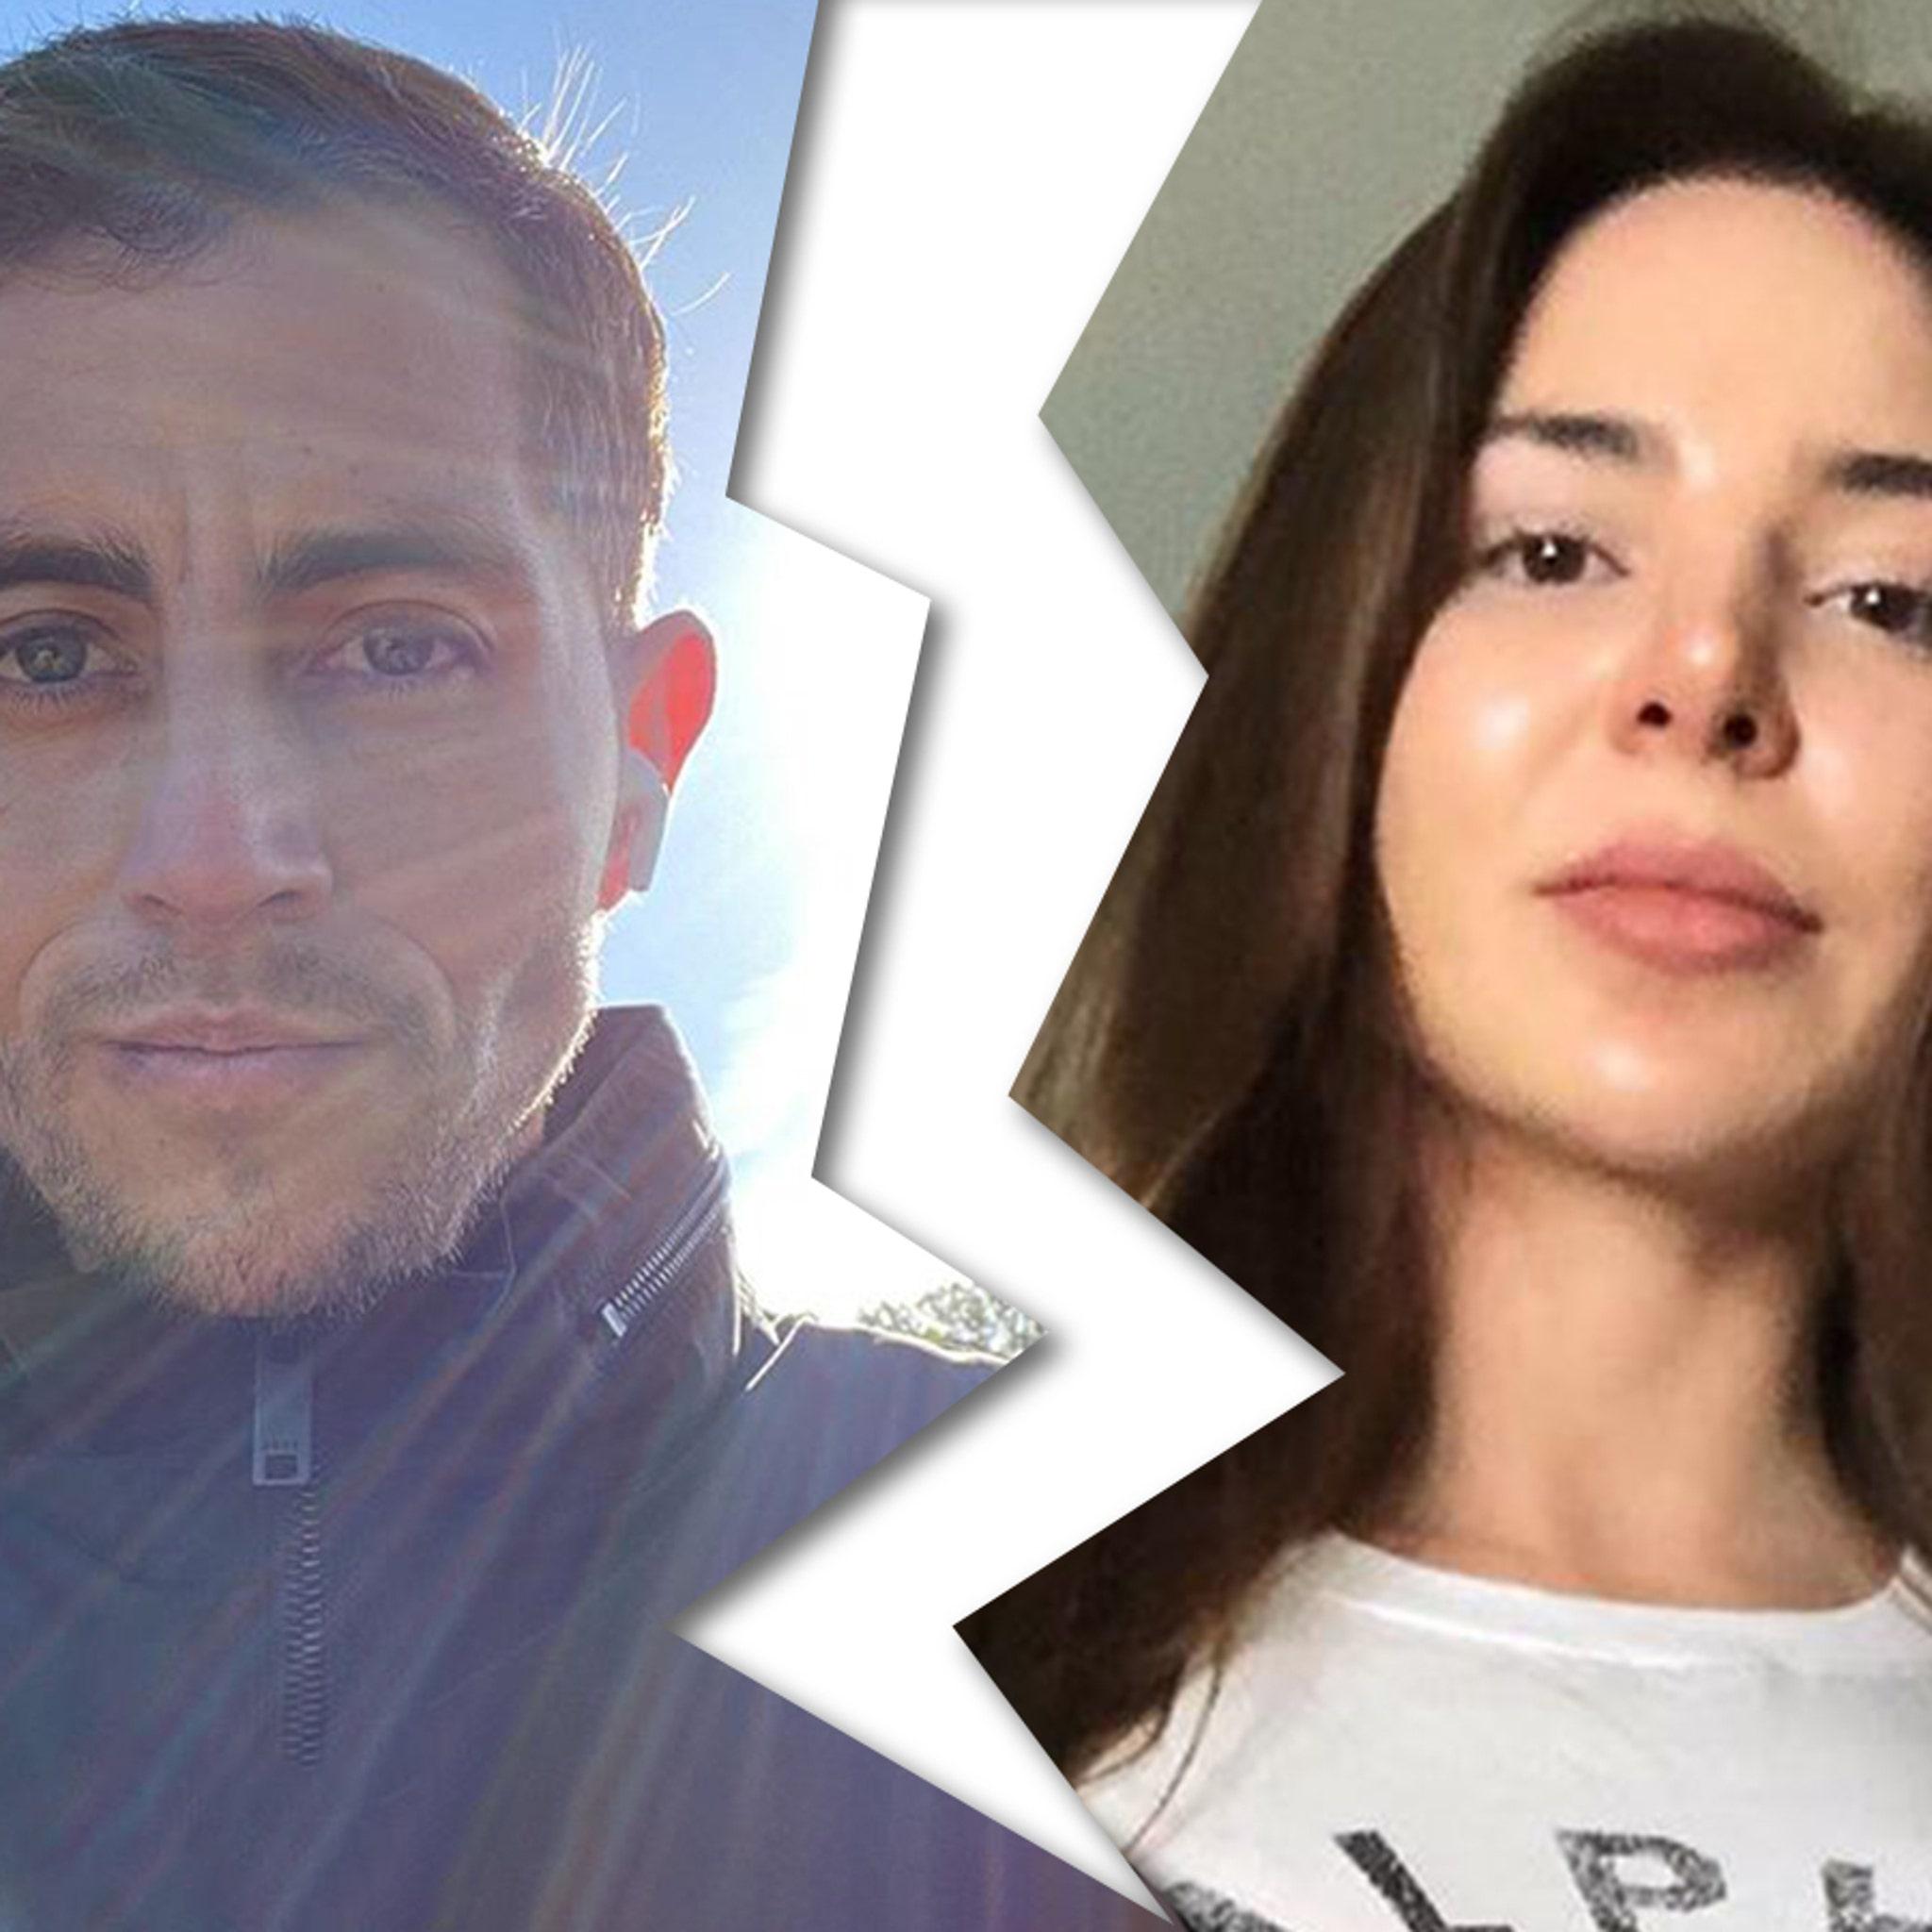 90 Day Fiance Star Jorge Nava Finally Files For Divorce